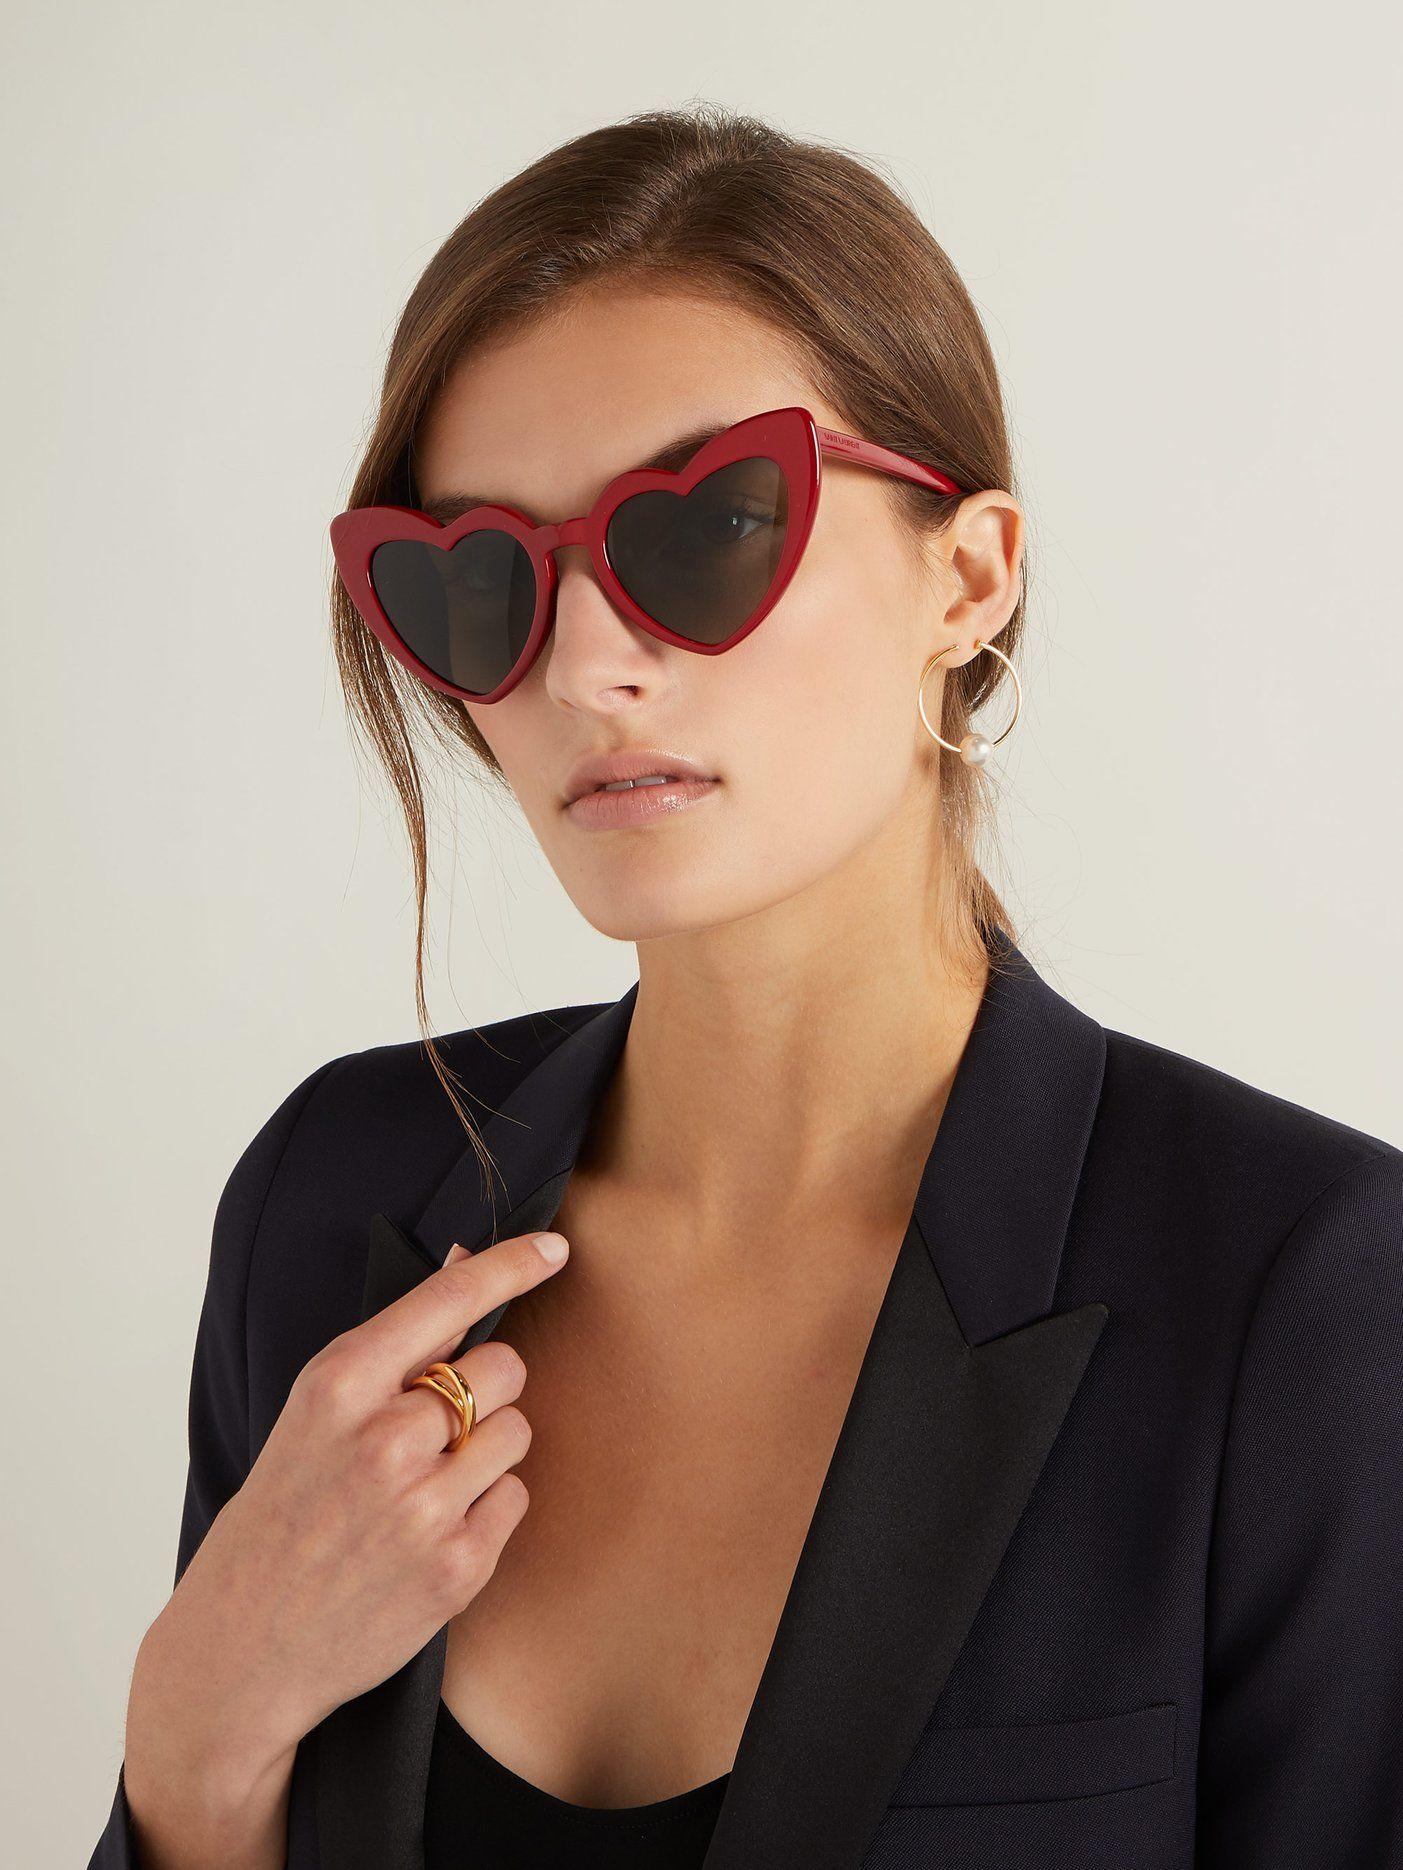 Acetate Shaped SunglassesSaint Heart Loulou Laurent XukPZiOT